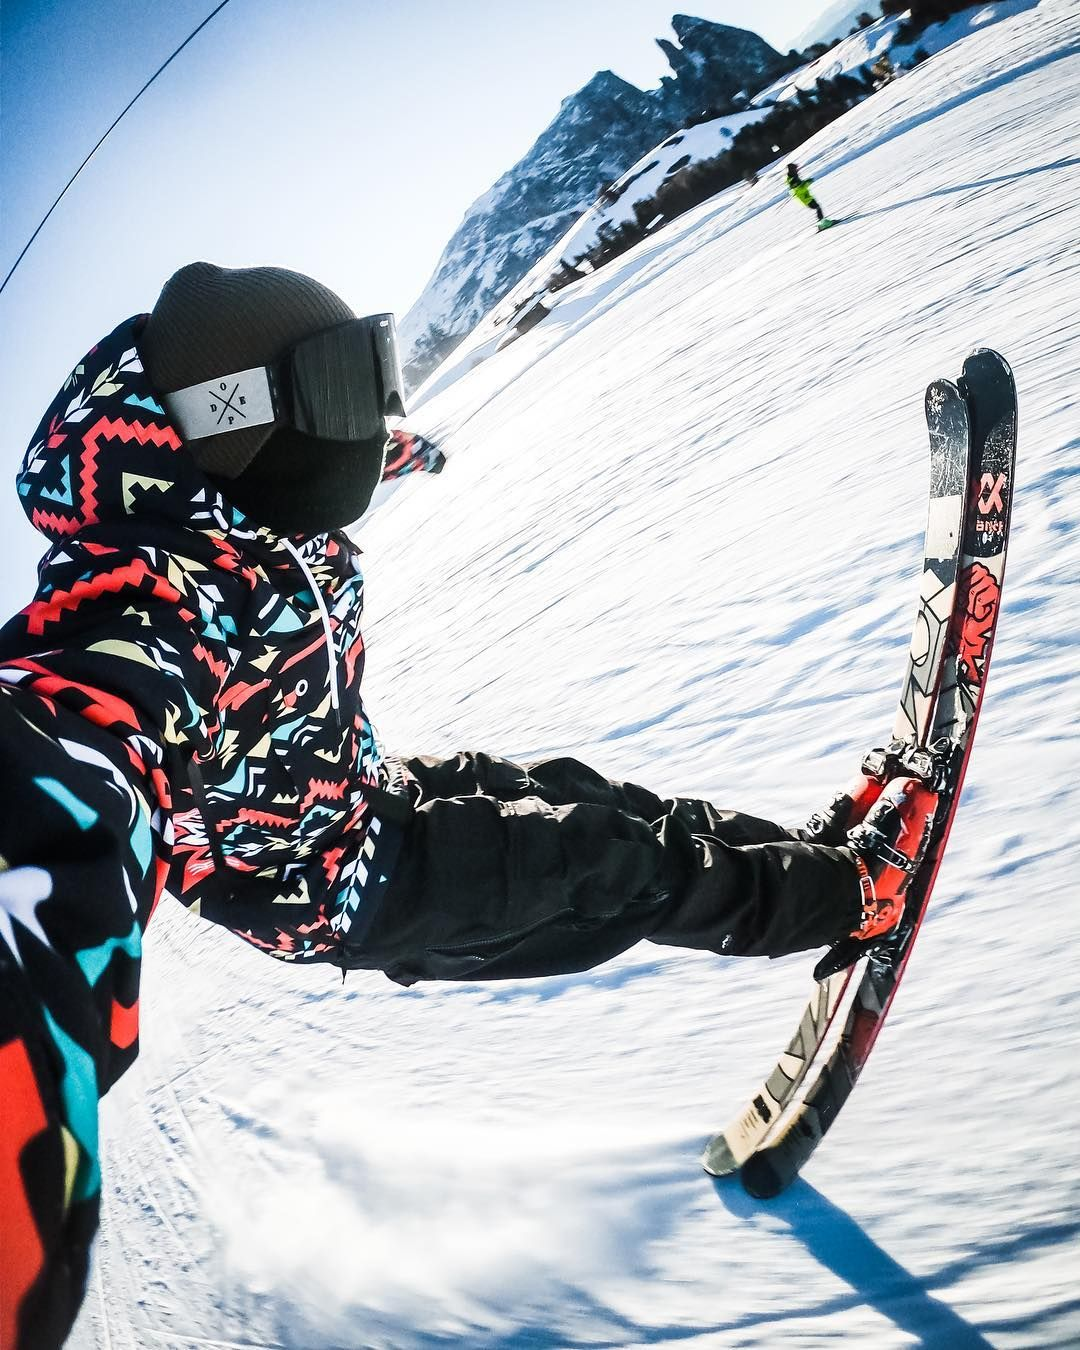 Pin On Snow Sports